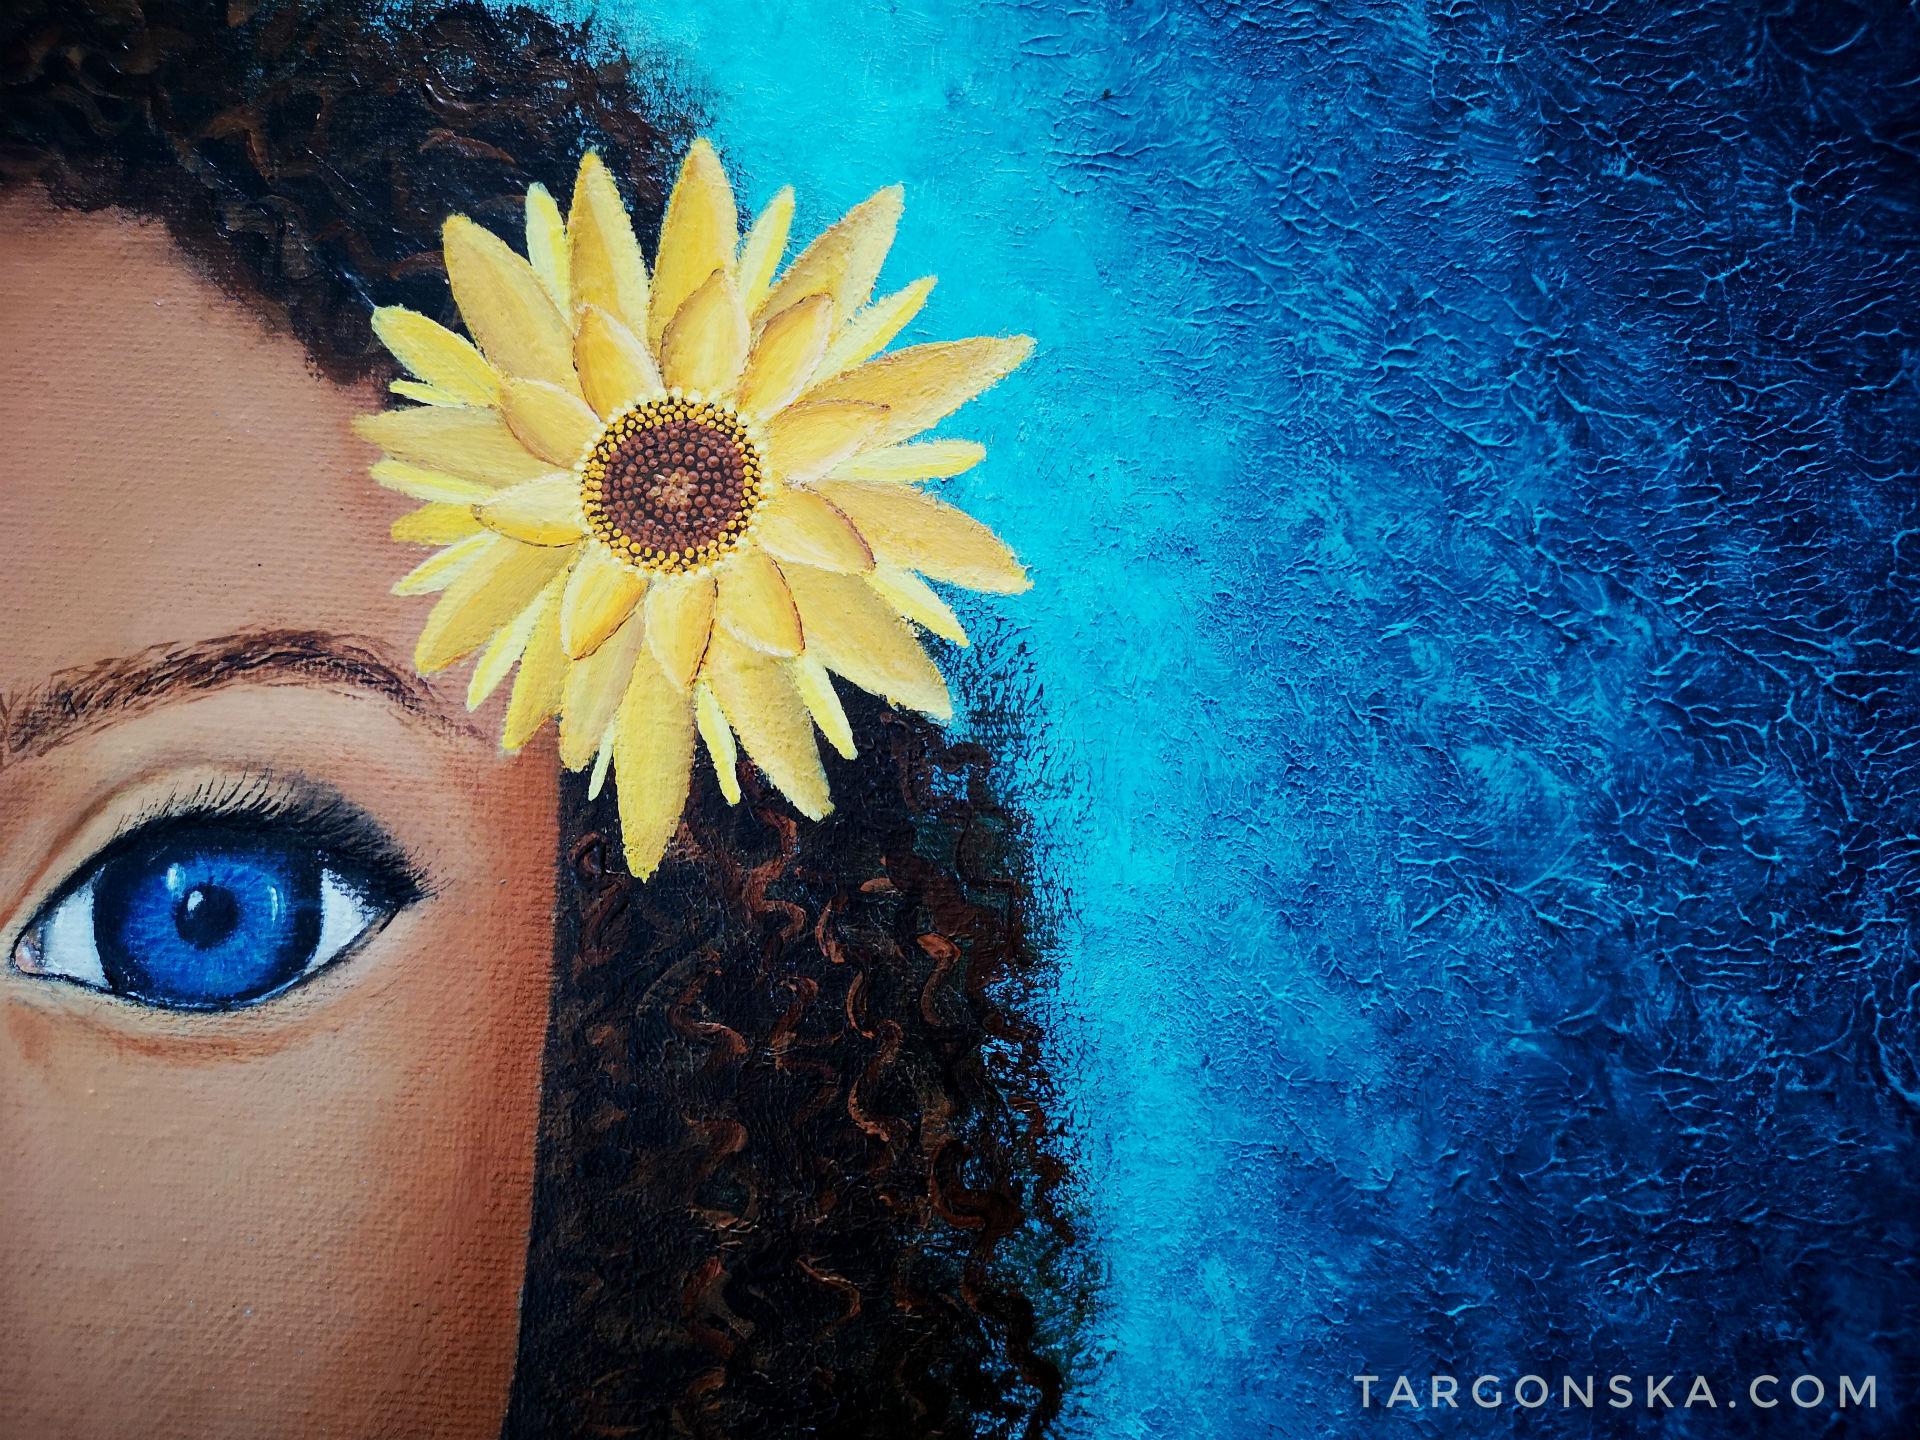 Targoska Girl with flower close up